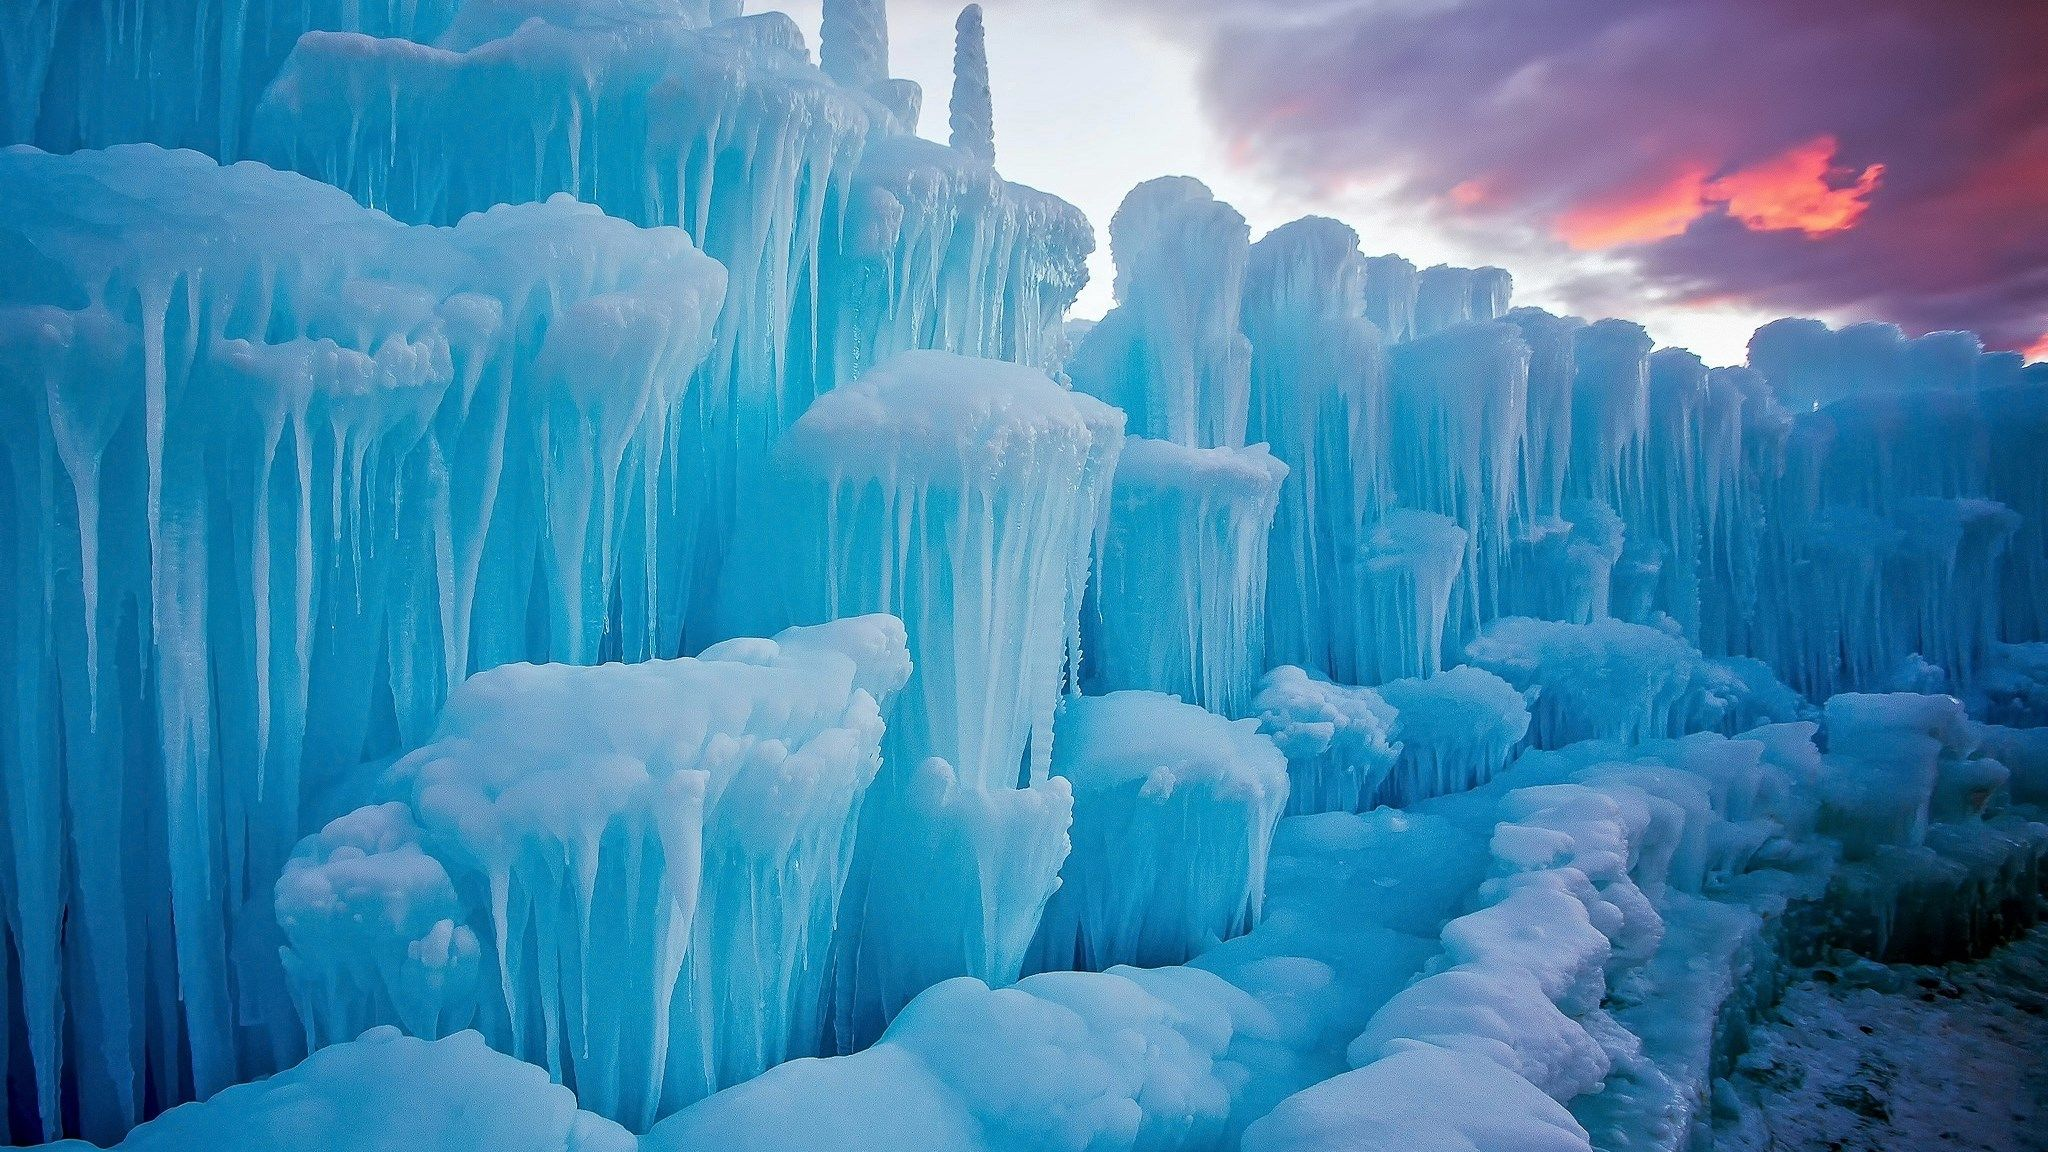 Ледяные скалы снежное царство зимы картинки